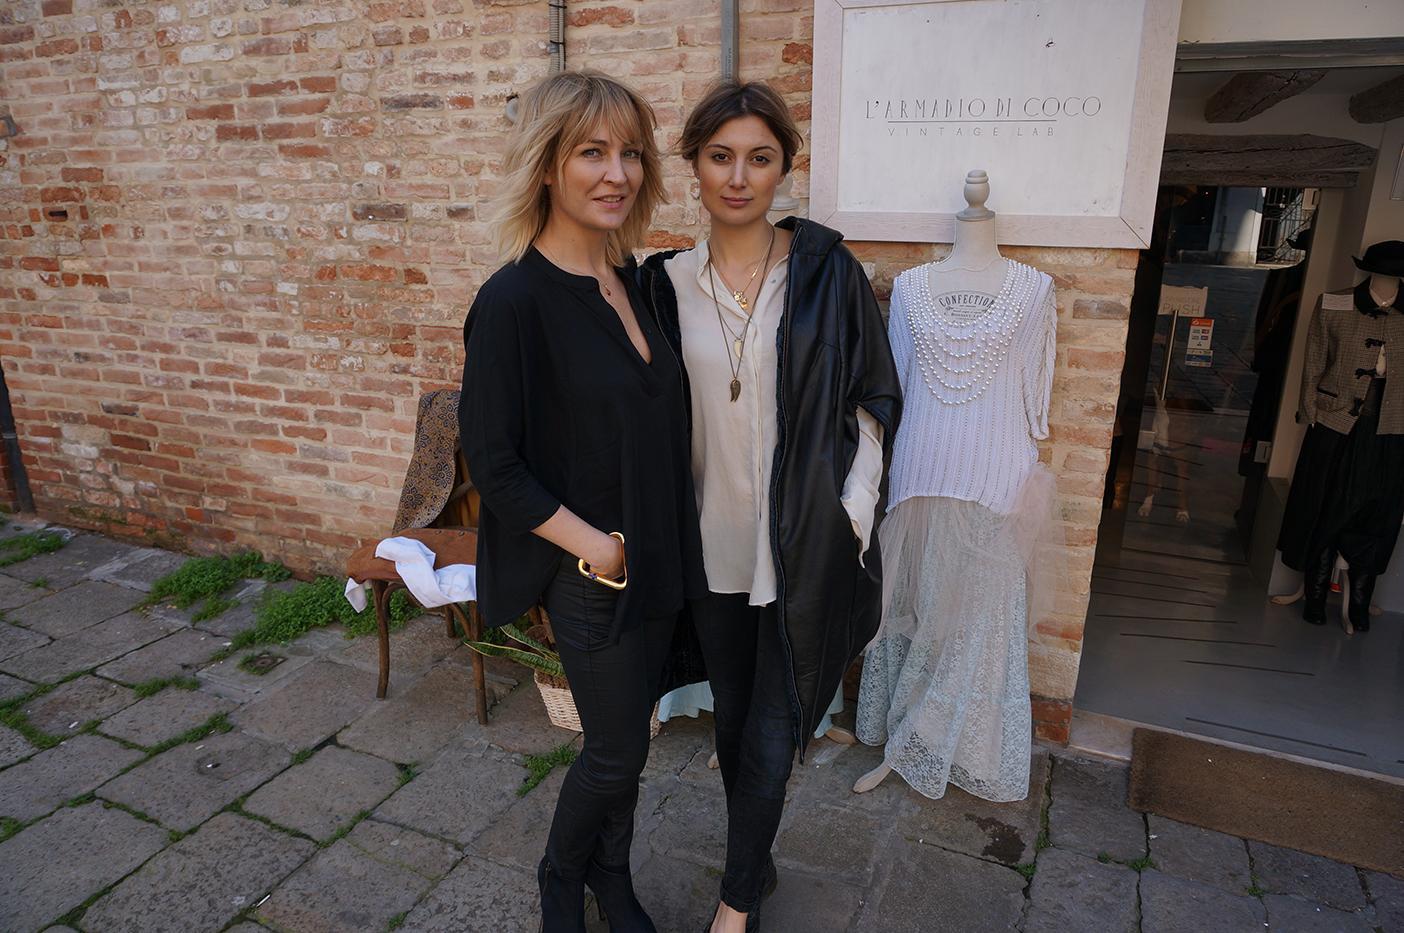 Anna Puślecka i Federica Bertolino właścicielka butiku vintage L'Armadio di Coco